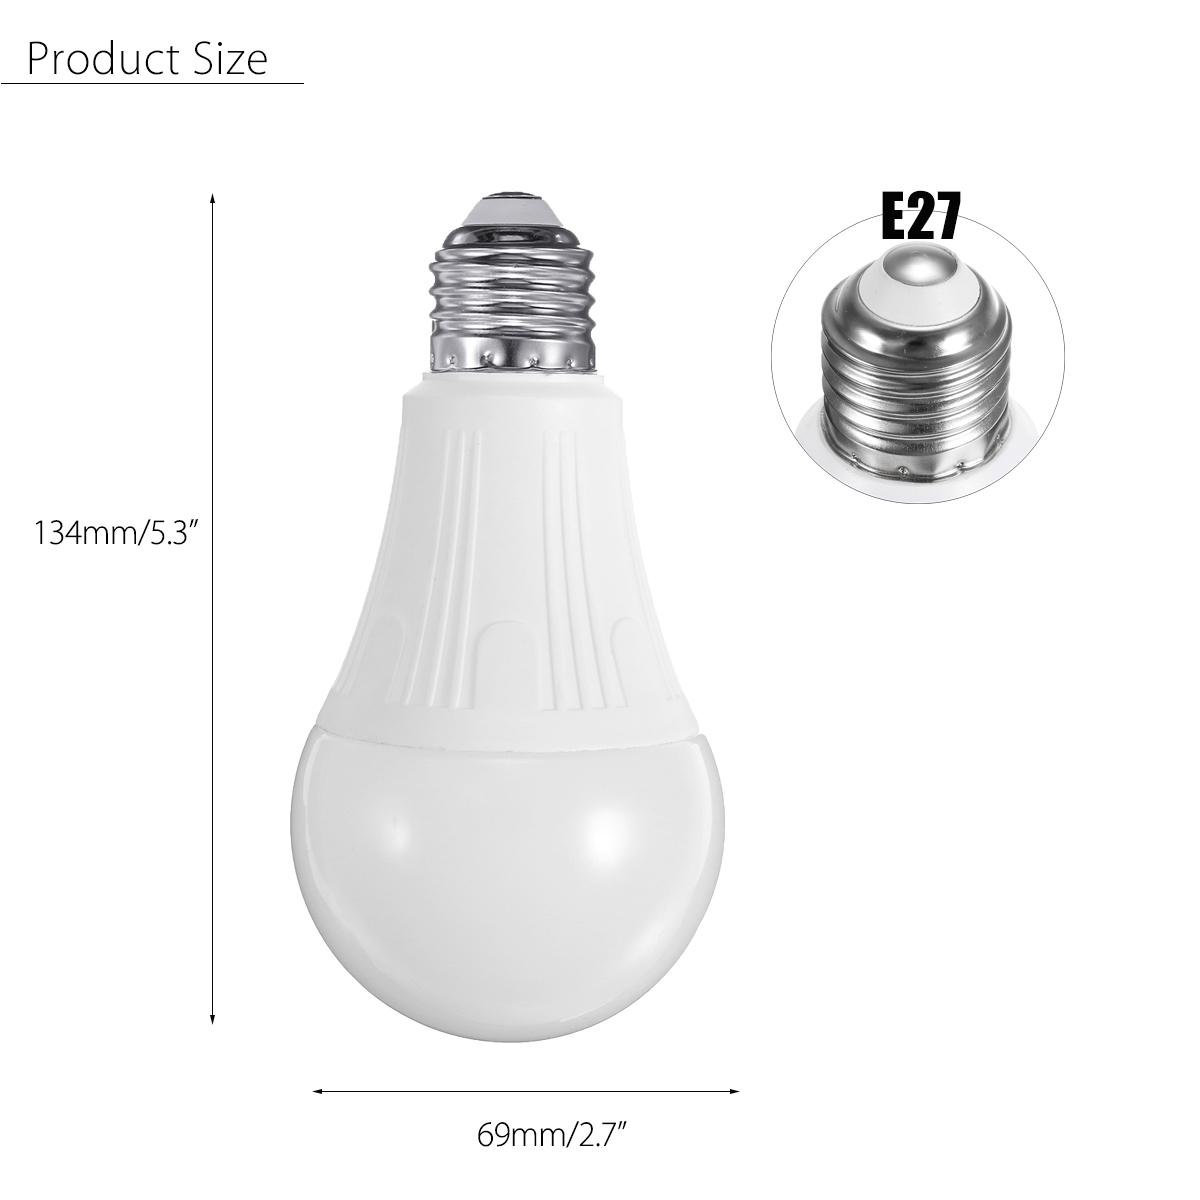 Ilumi Light Bulb E27 Wireless Wifi App Rc Smart Bulb Lamp Light Rgb for Echo Alexa